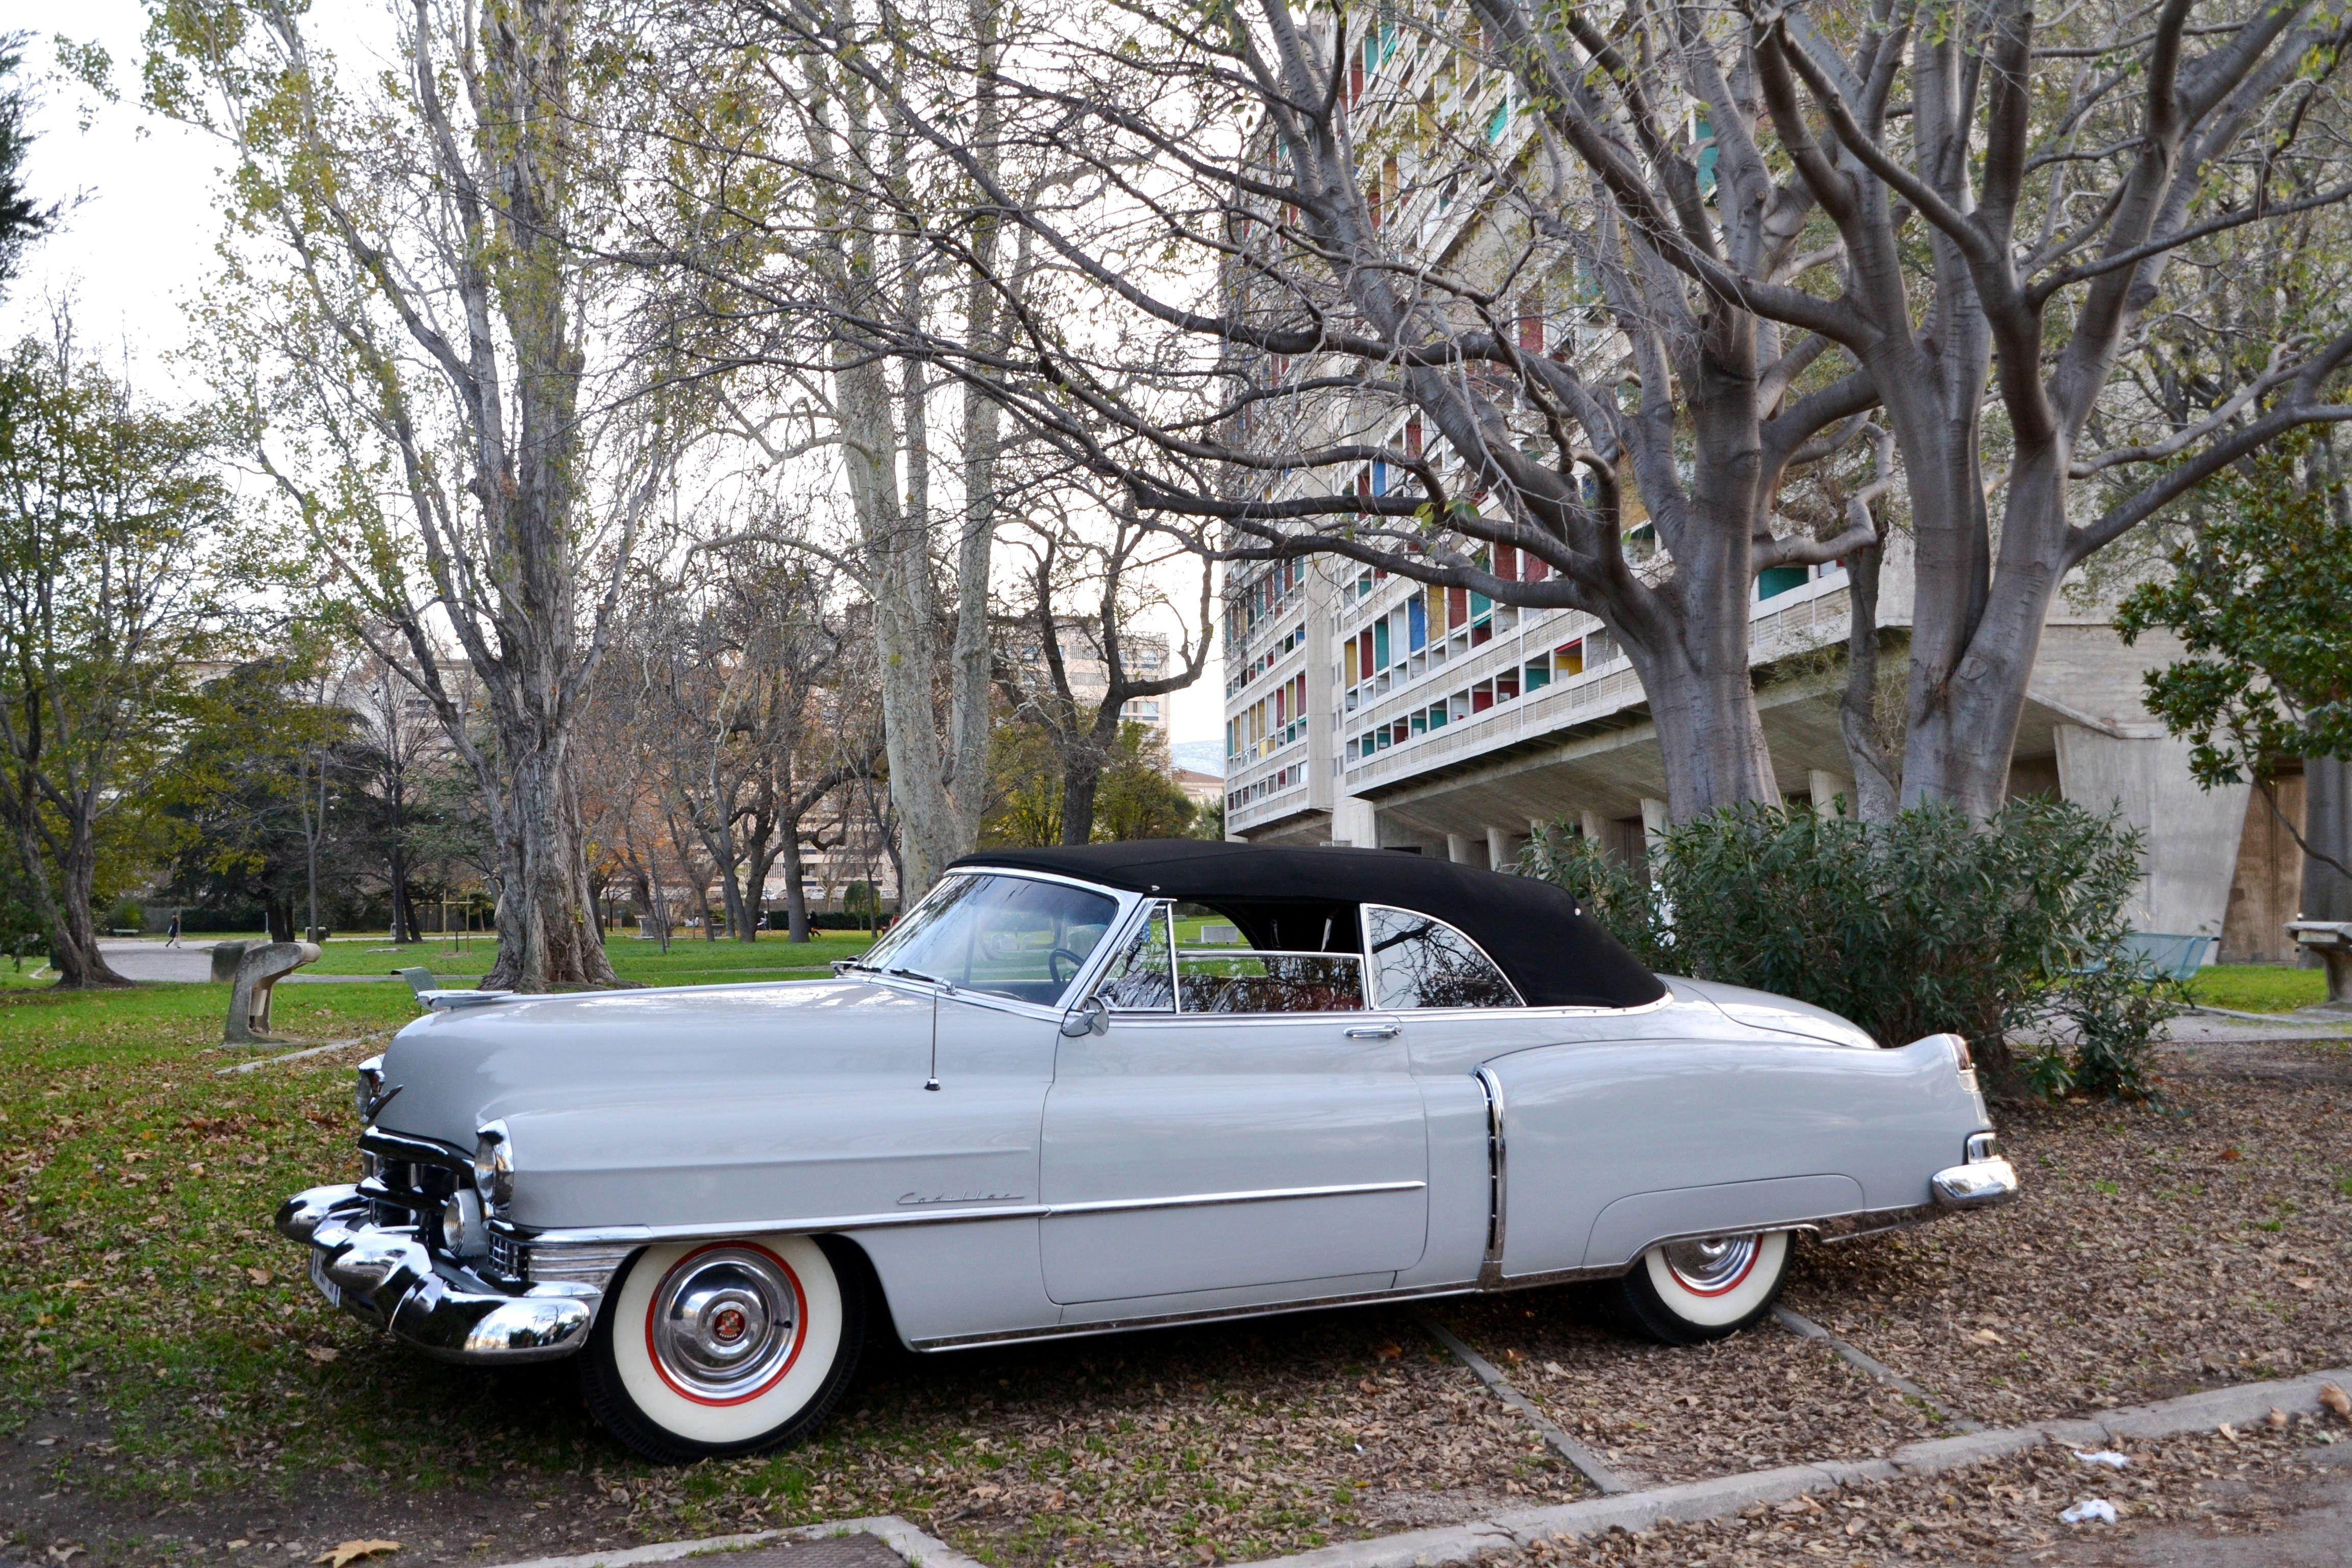 1951 Cadillac Series 62 Voiture De Collection Vendre Convertible